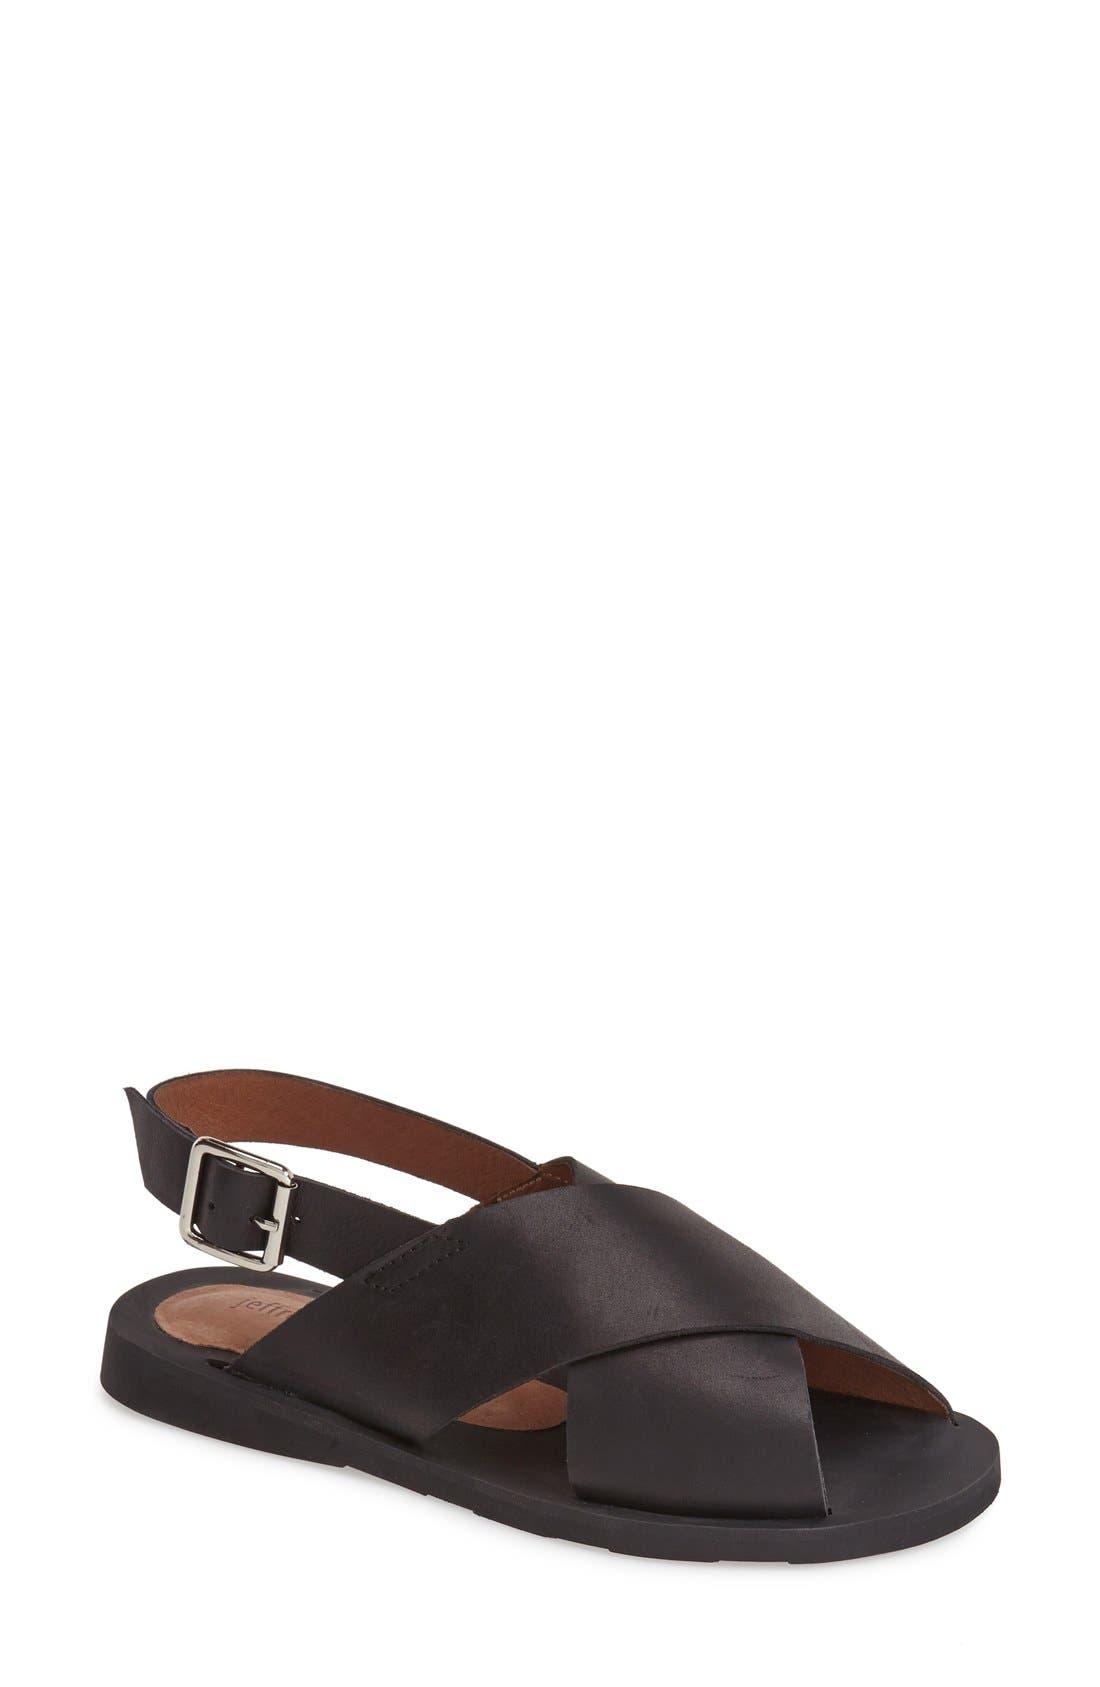 Alternate Image 1 Selected - Jeffrey Campbell 'Maldives' Leather Sandal (Women)